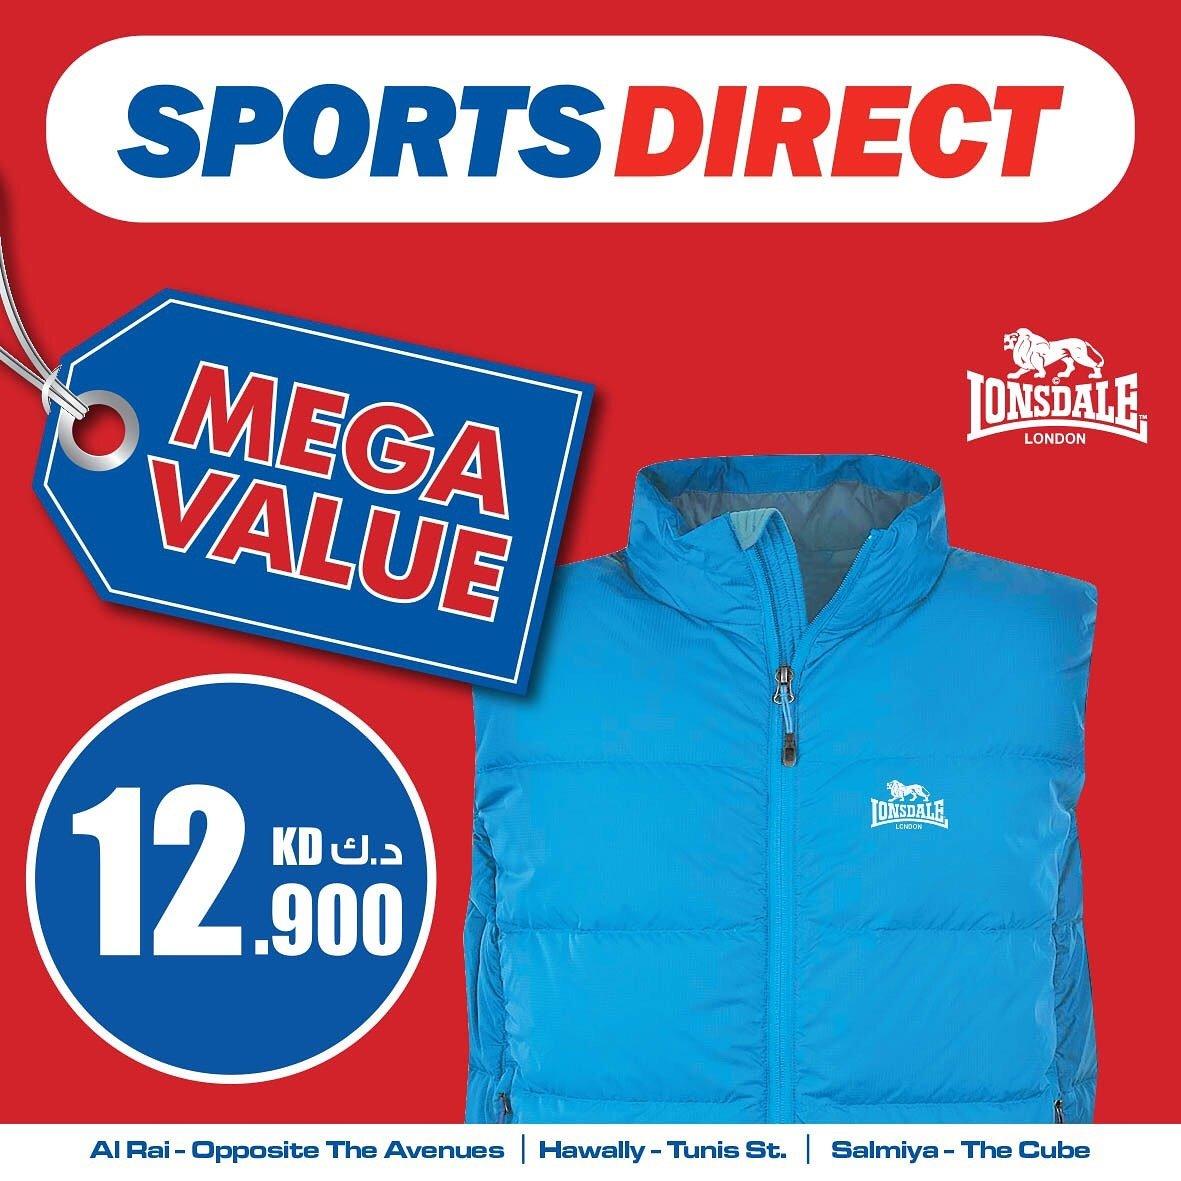 Sports Direct.... Low prices guaranteed.  سبورتس دايركت ...... ضمان أفضل ألاسعار https://t.co/7MxbP10KKu